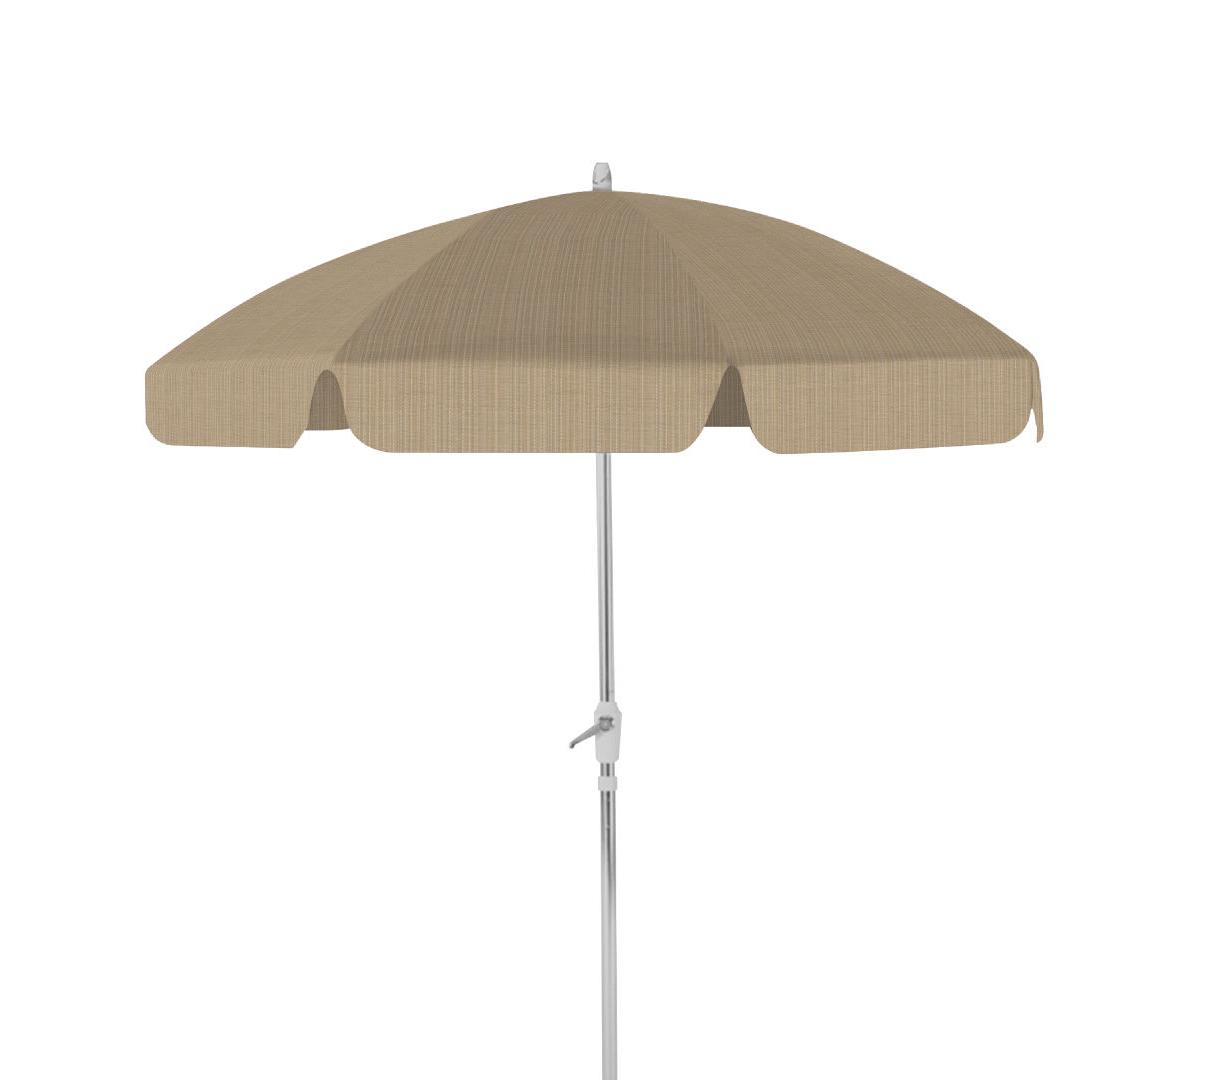 Drape Umbrella 7 1/2' 8 Rib Drape Umbrella With Tilttelescope Casual Intended For Most Current Drape Umbrellas (View 6 of 20)